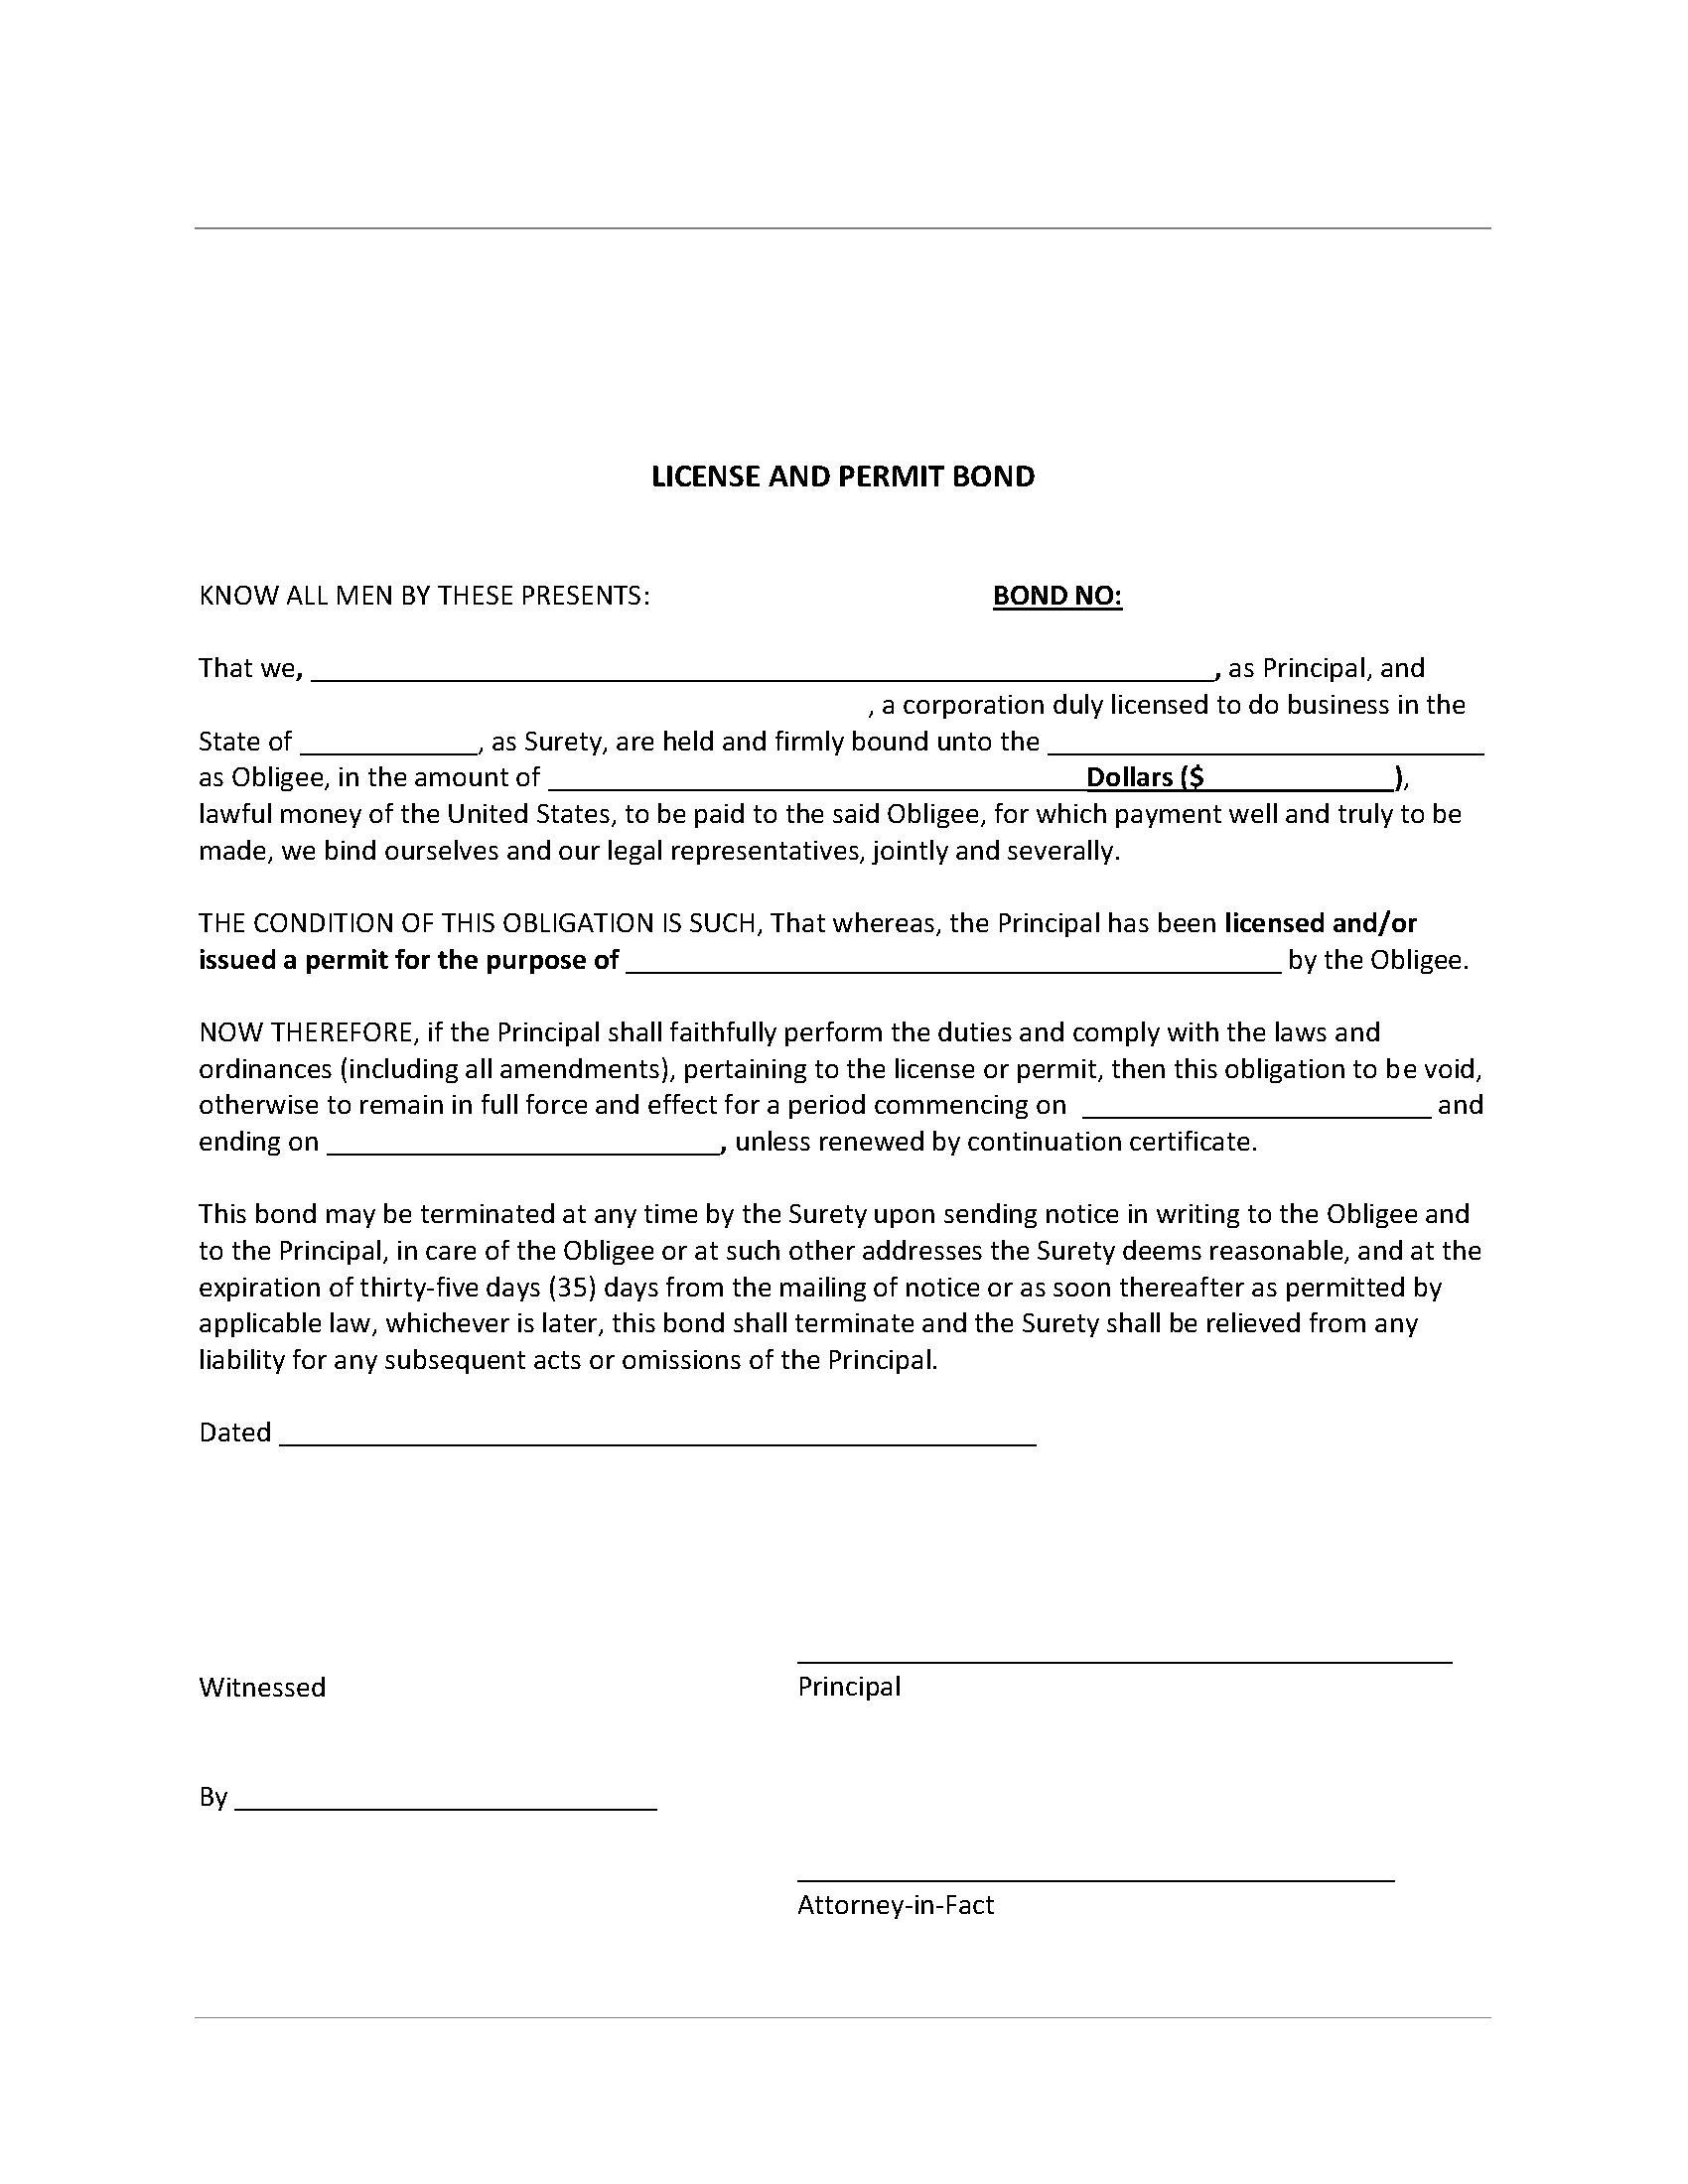 Pulaski - County License/Permit sample image